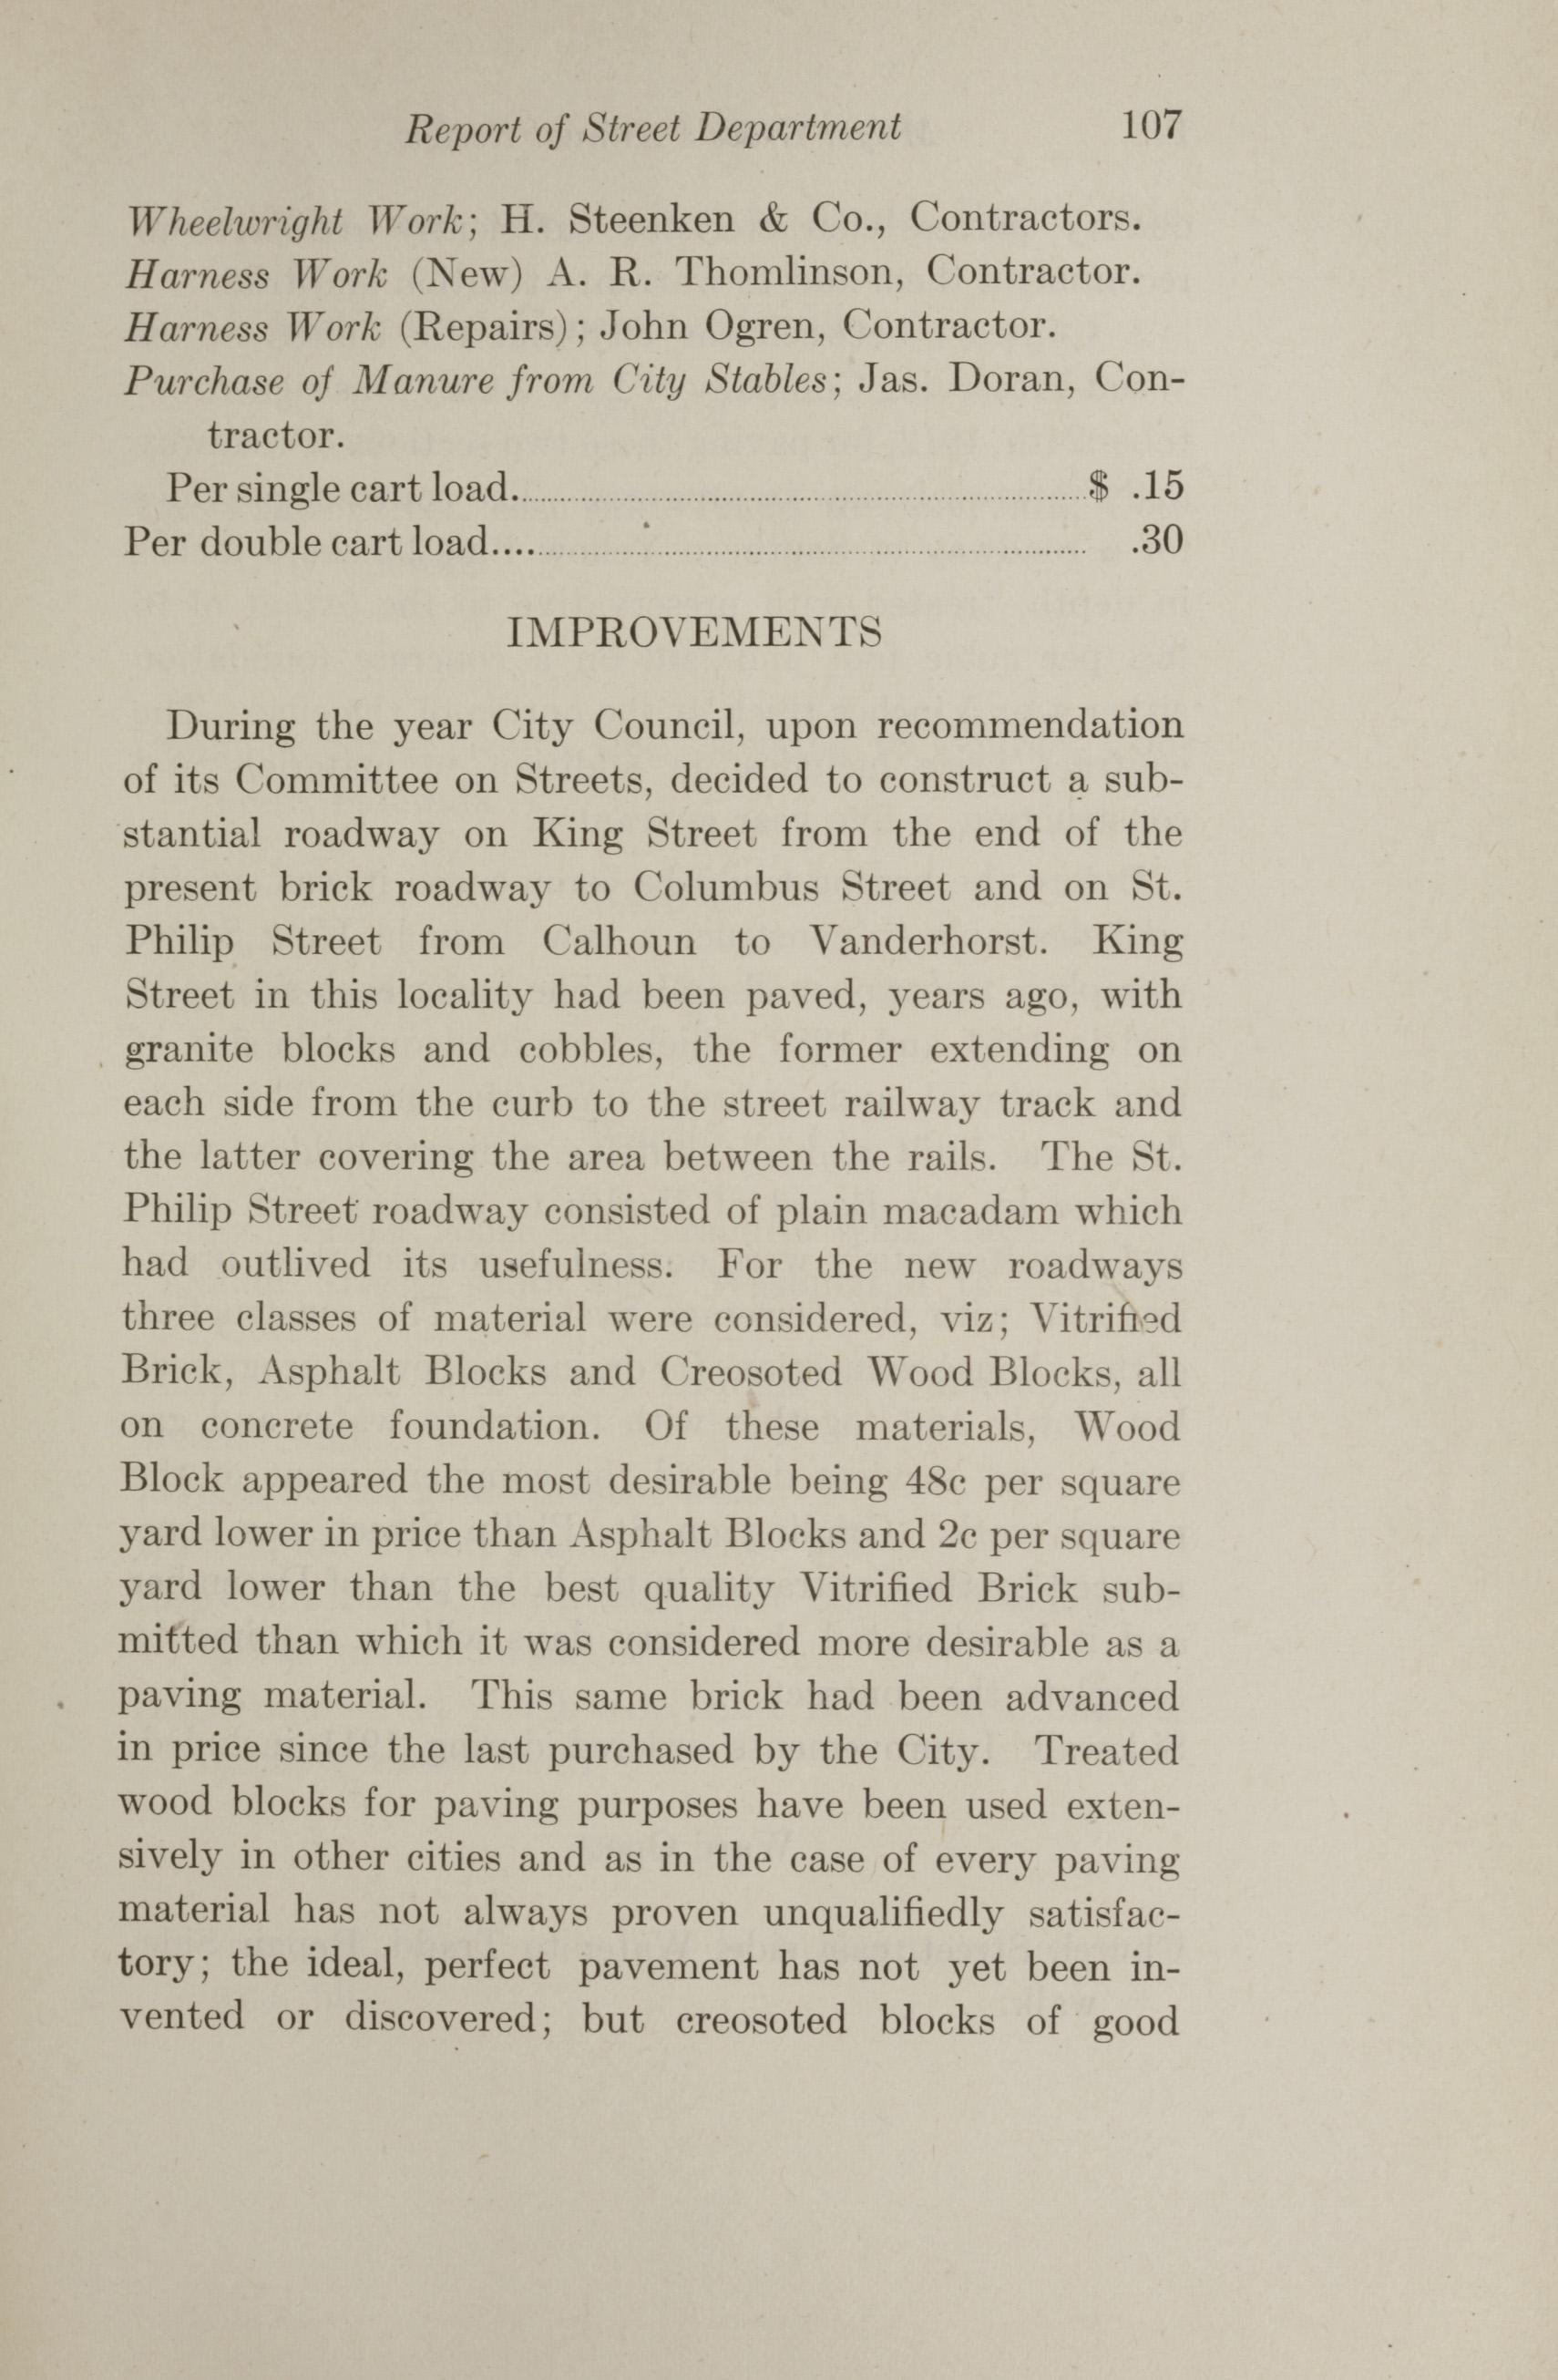 Charleston Yearbook, 1912, page 107